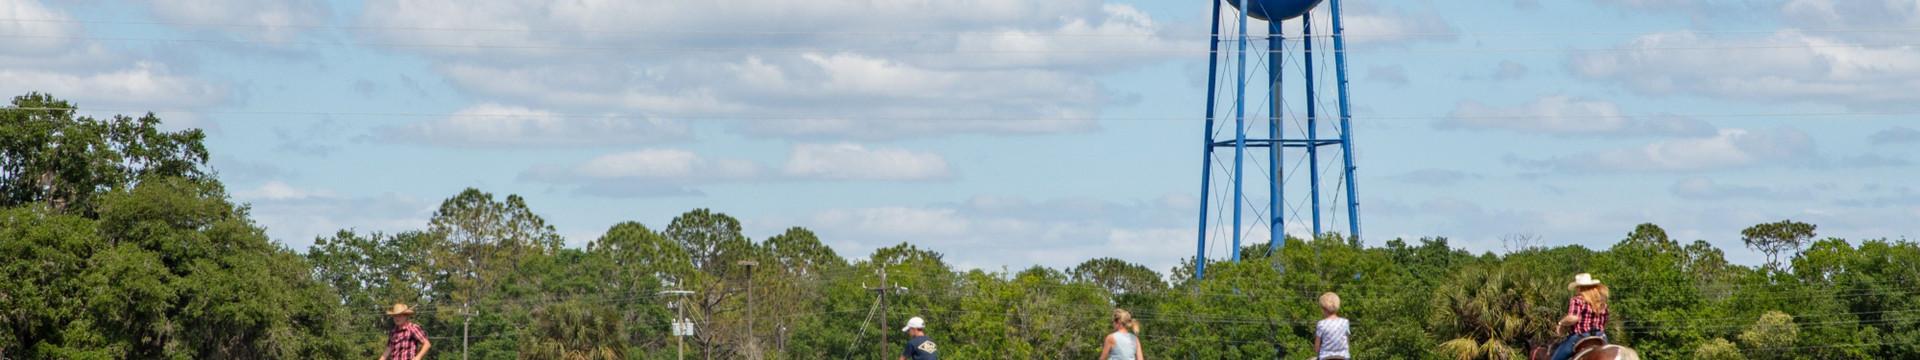 Horseback Riding Orlando Florida | Guided Trail Ride